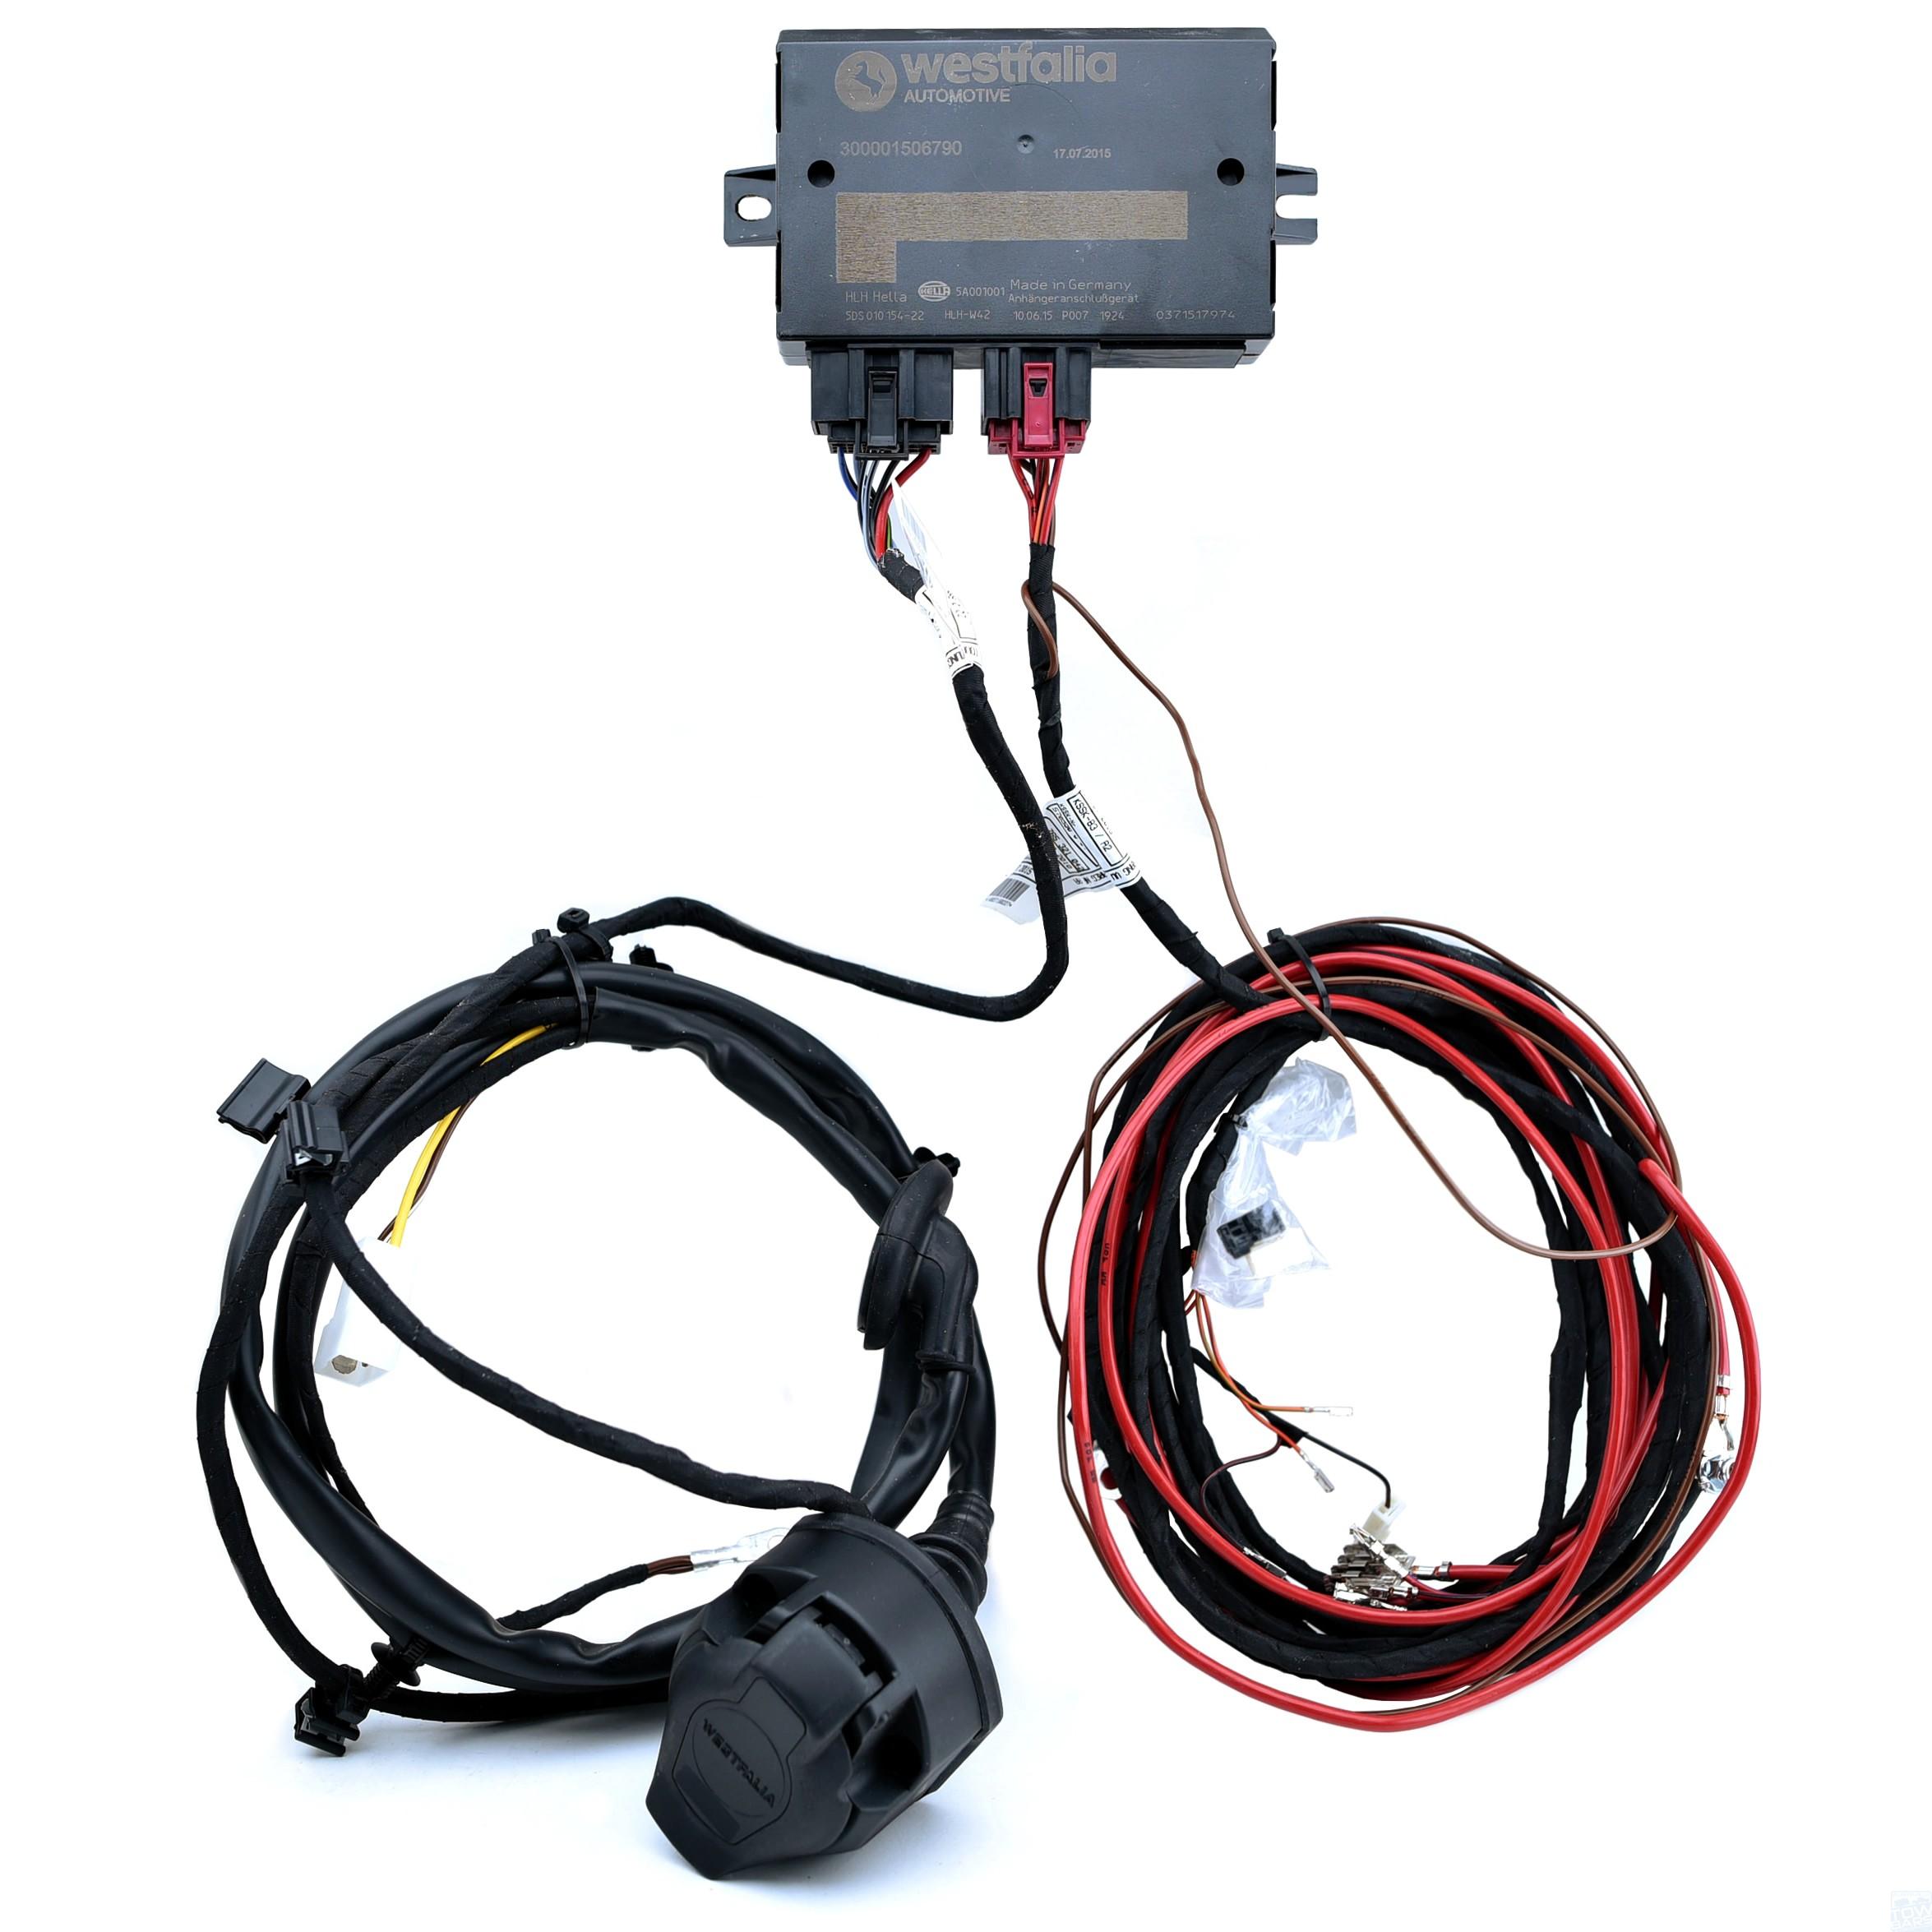 Audi Q7 Towbar Wiring Diagram - Load Wiring Diagram mug-locate -  mug-locate.ristorantesicilia.it | Audi Trailer Wiring Diagram |  | Ristorante Sicilia